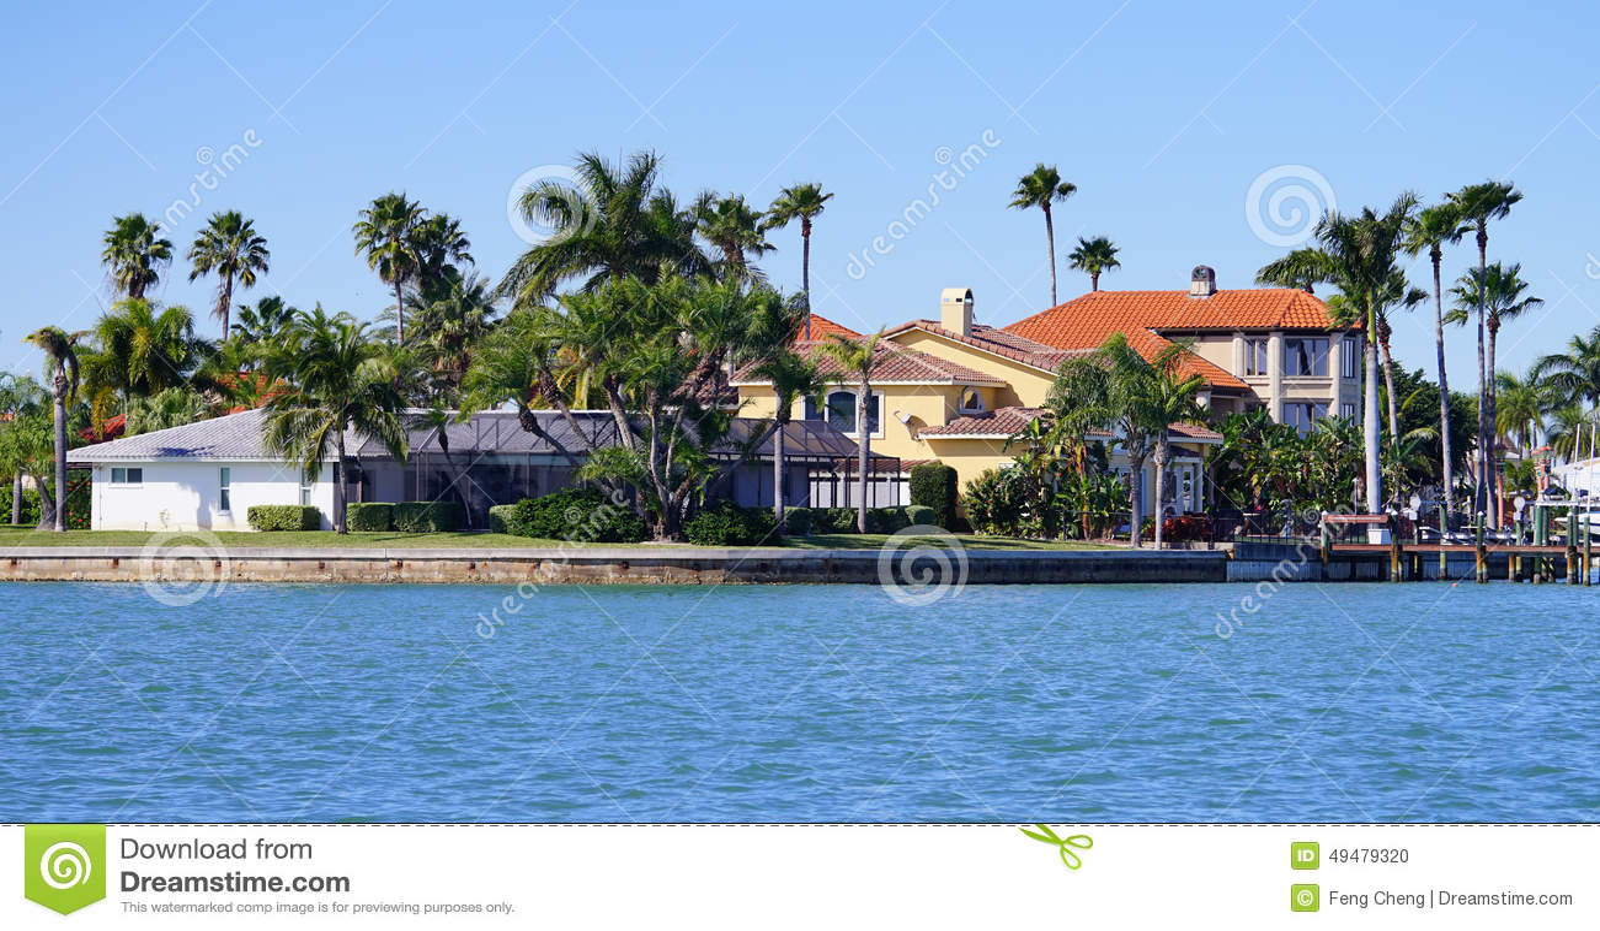 a船坞海滨船坞全景有别墅小船的在城阳湾,佛罗里达.坦帕售在联排别墅图片